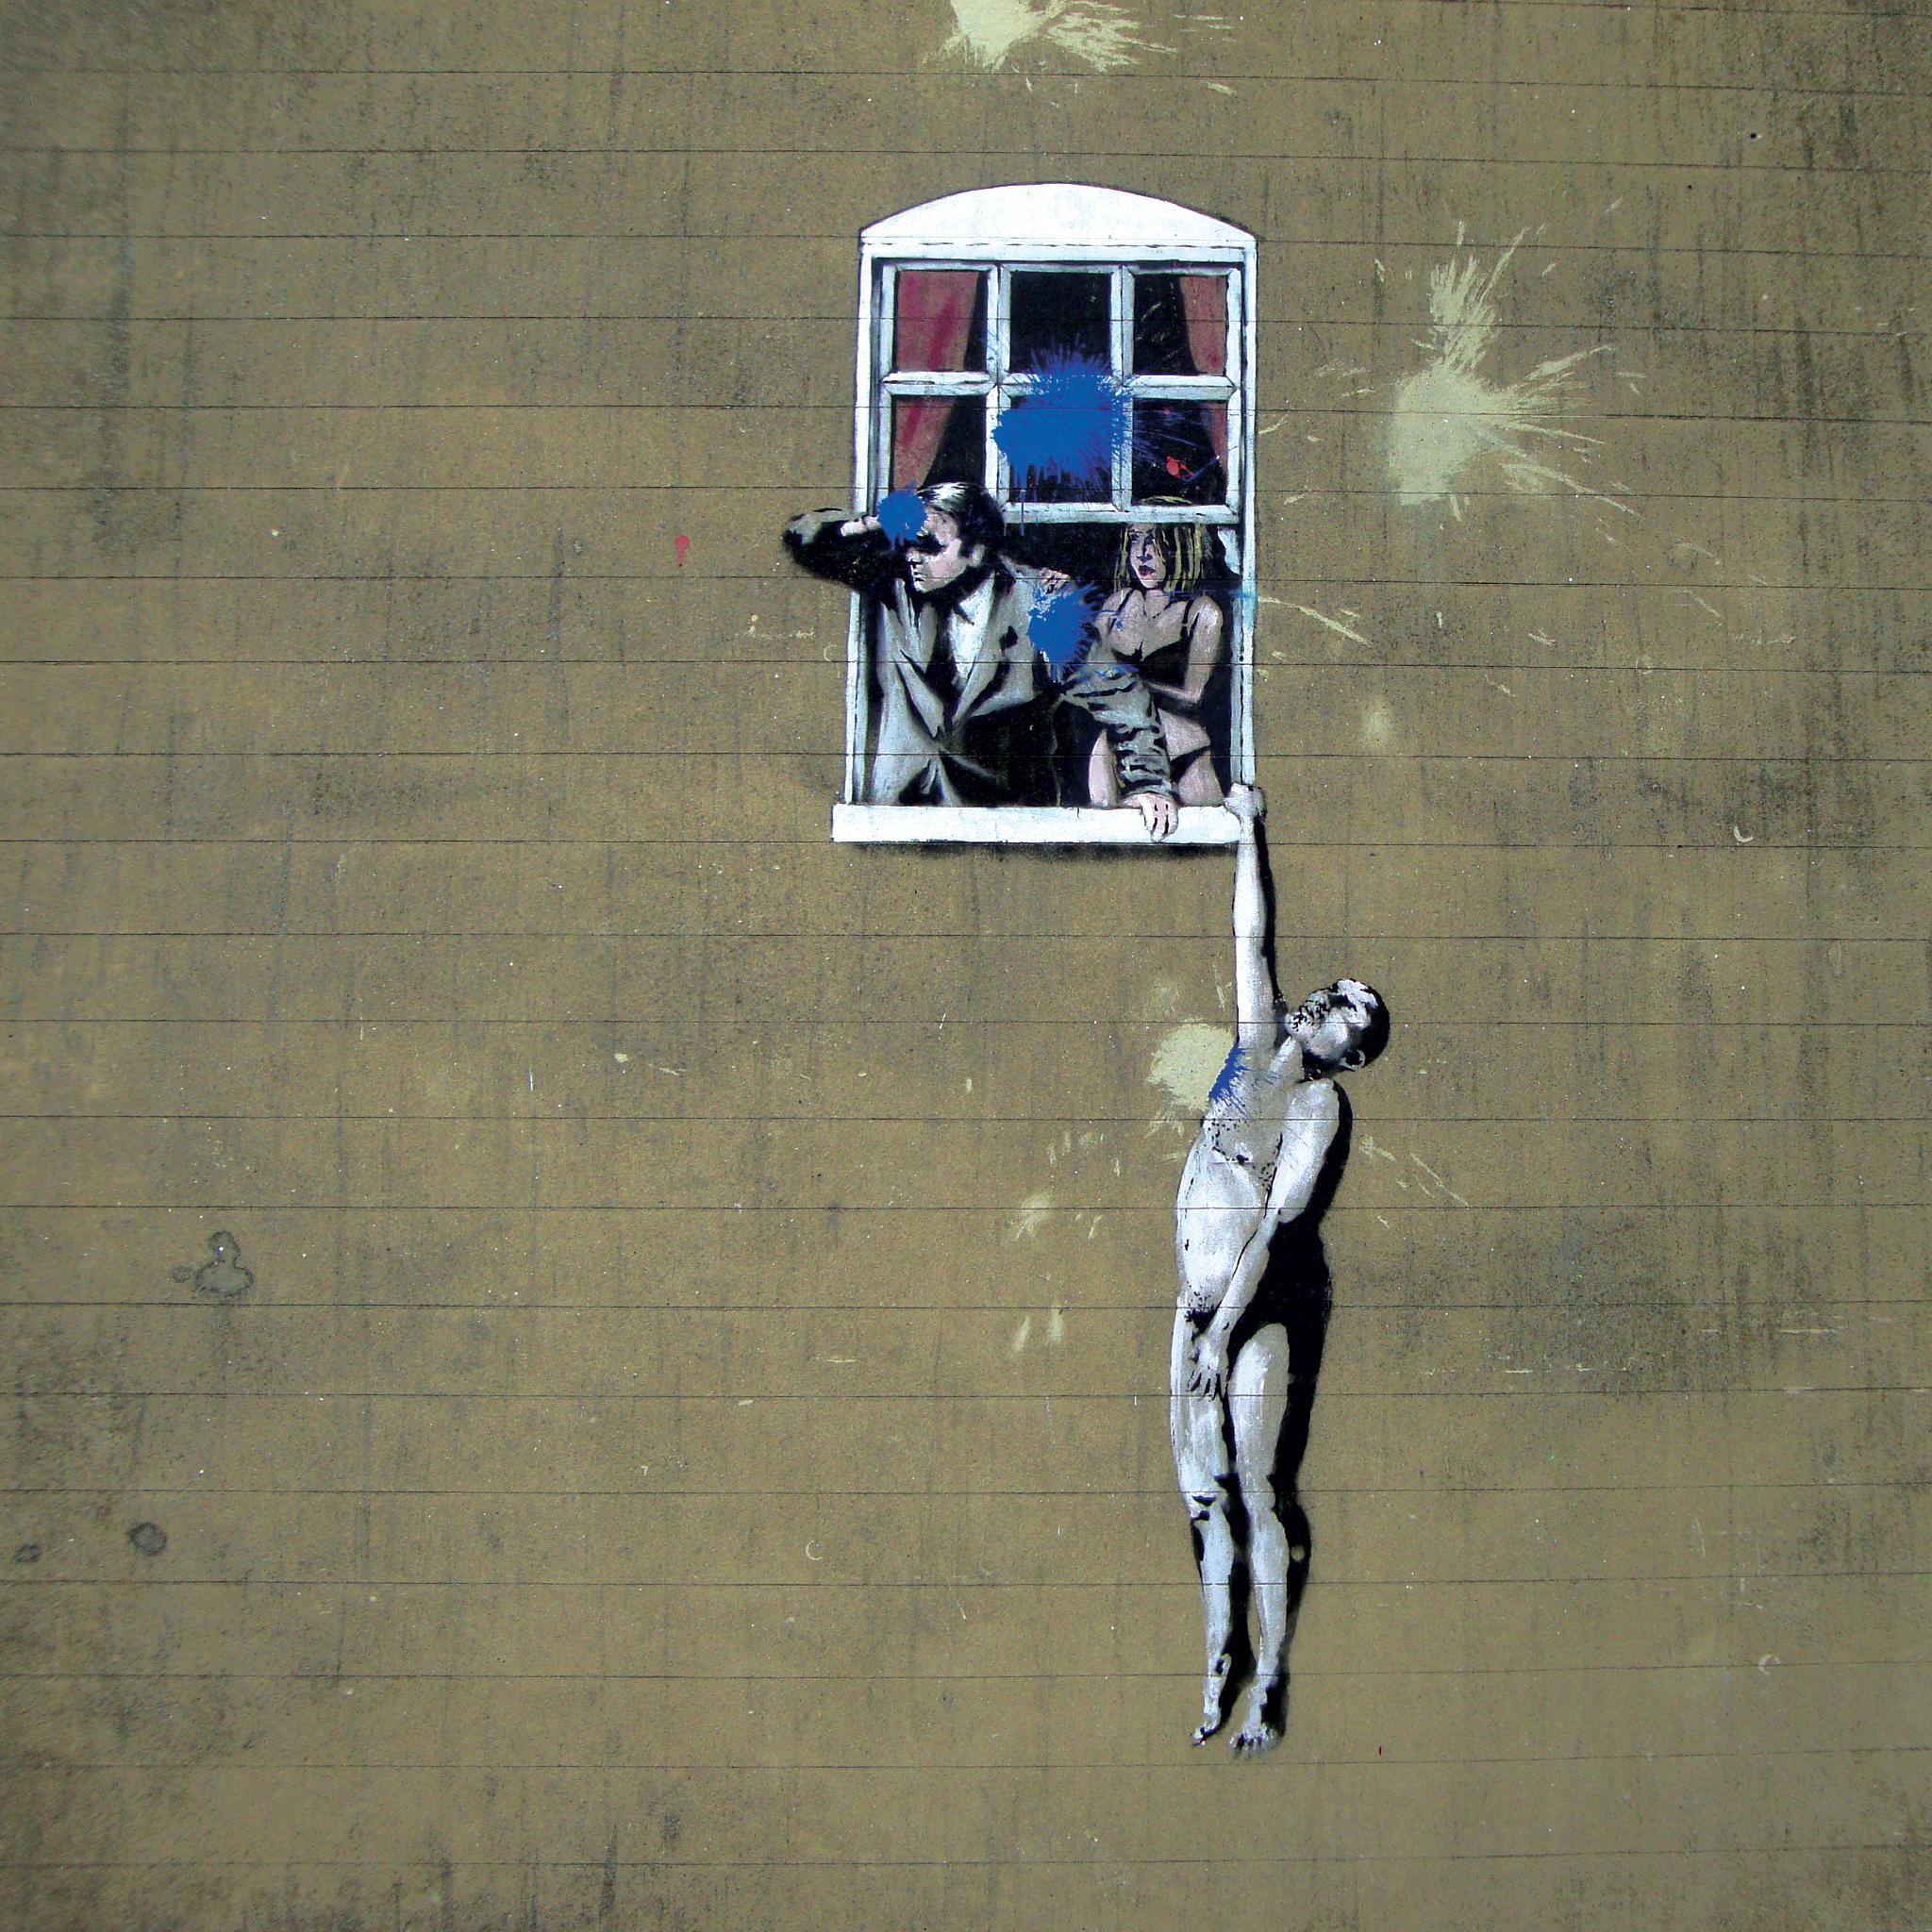 Banksy-Hung-Window-3Wallpapers-iPad-Retina